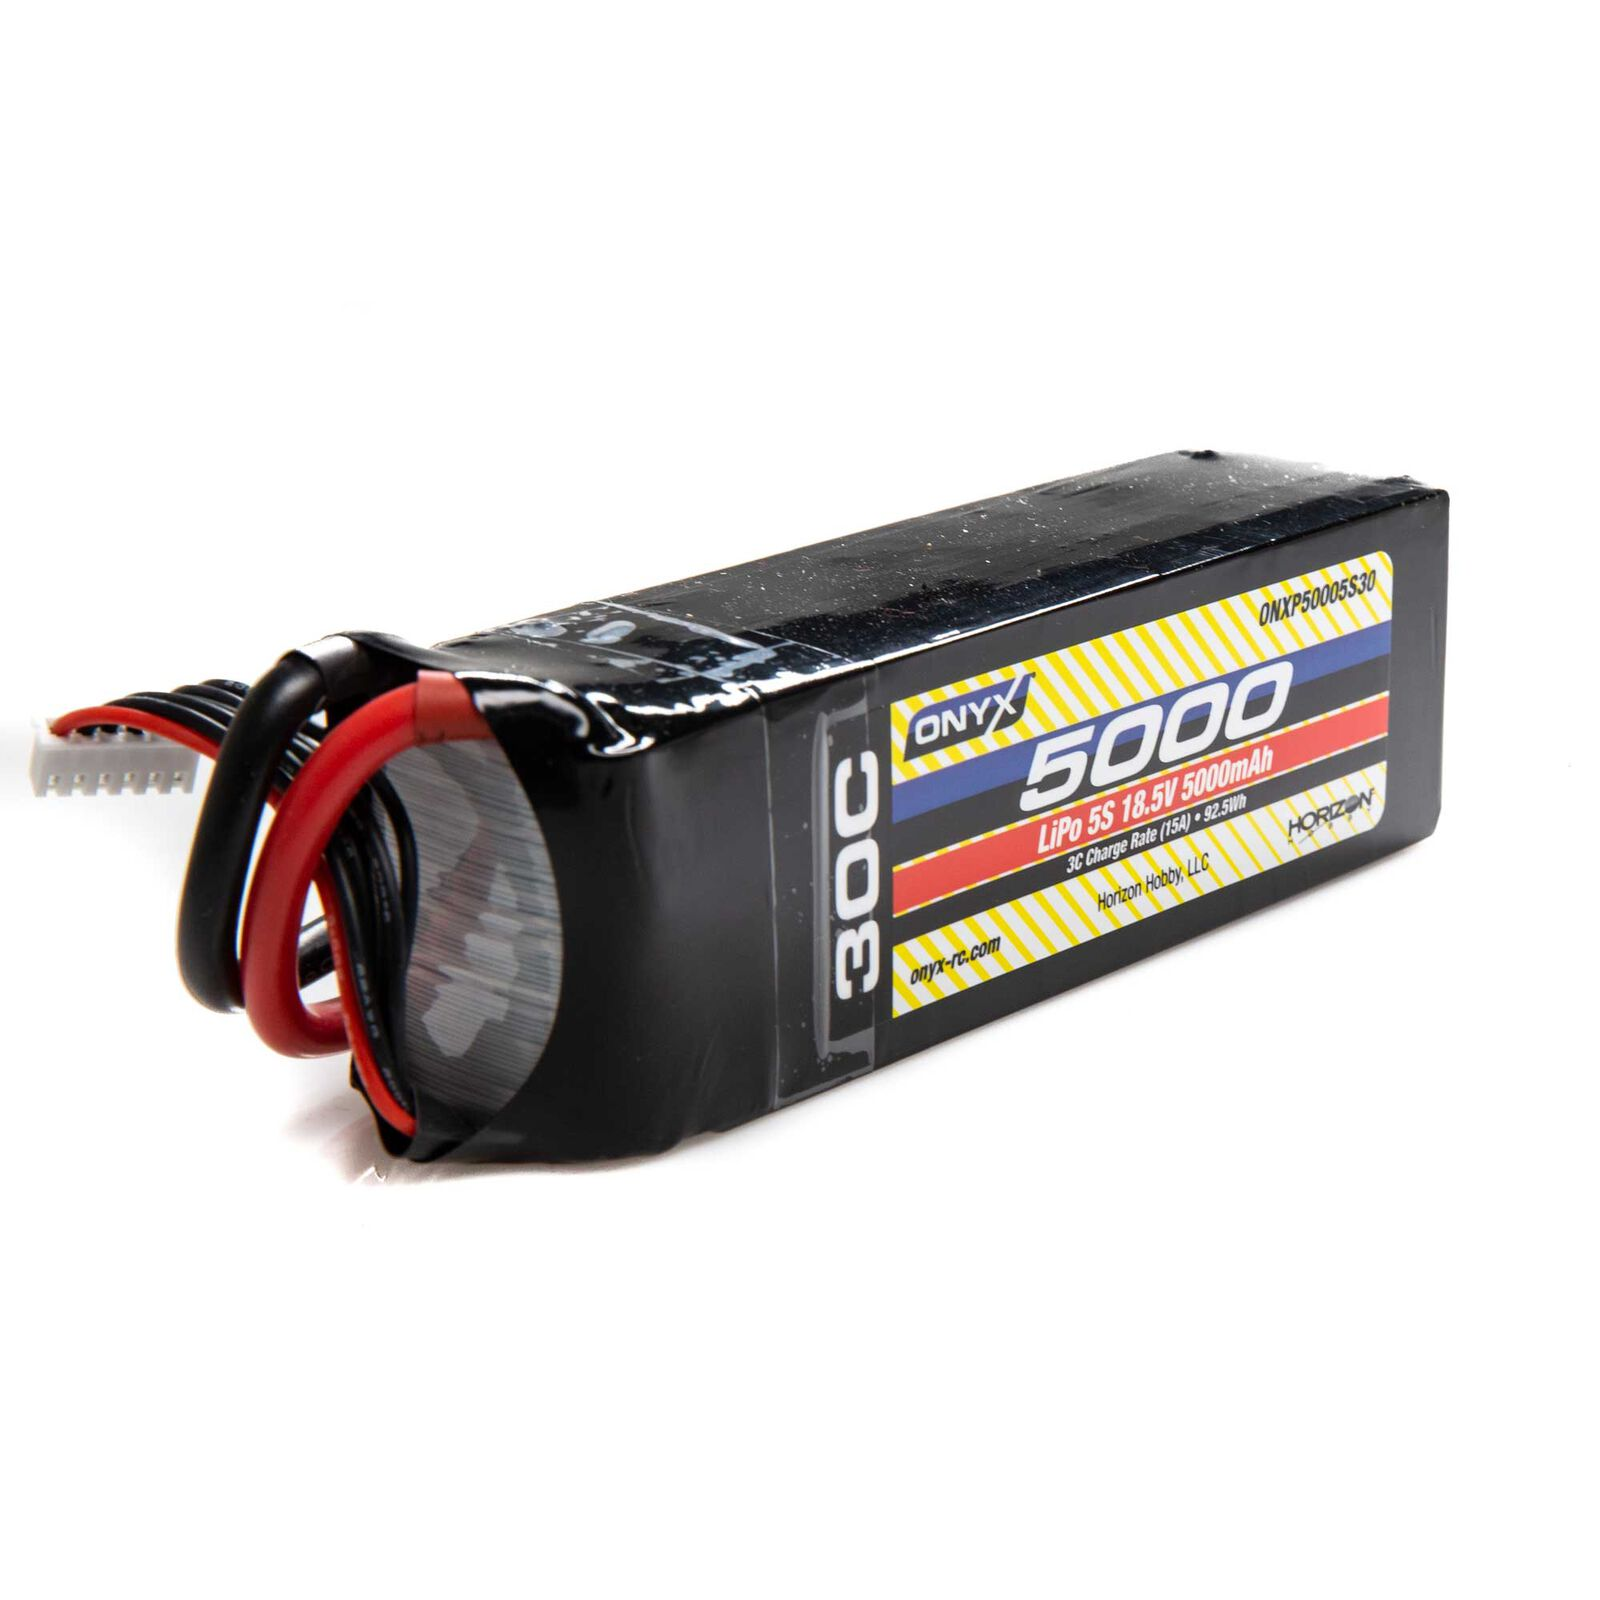 18.5V 5000mAh 5S 30C LiPo Battery: EC5